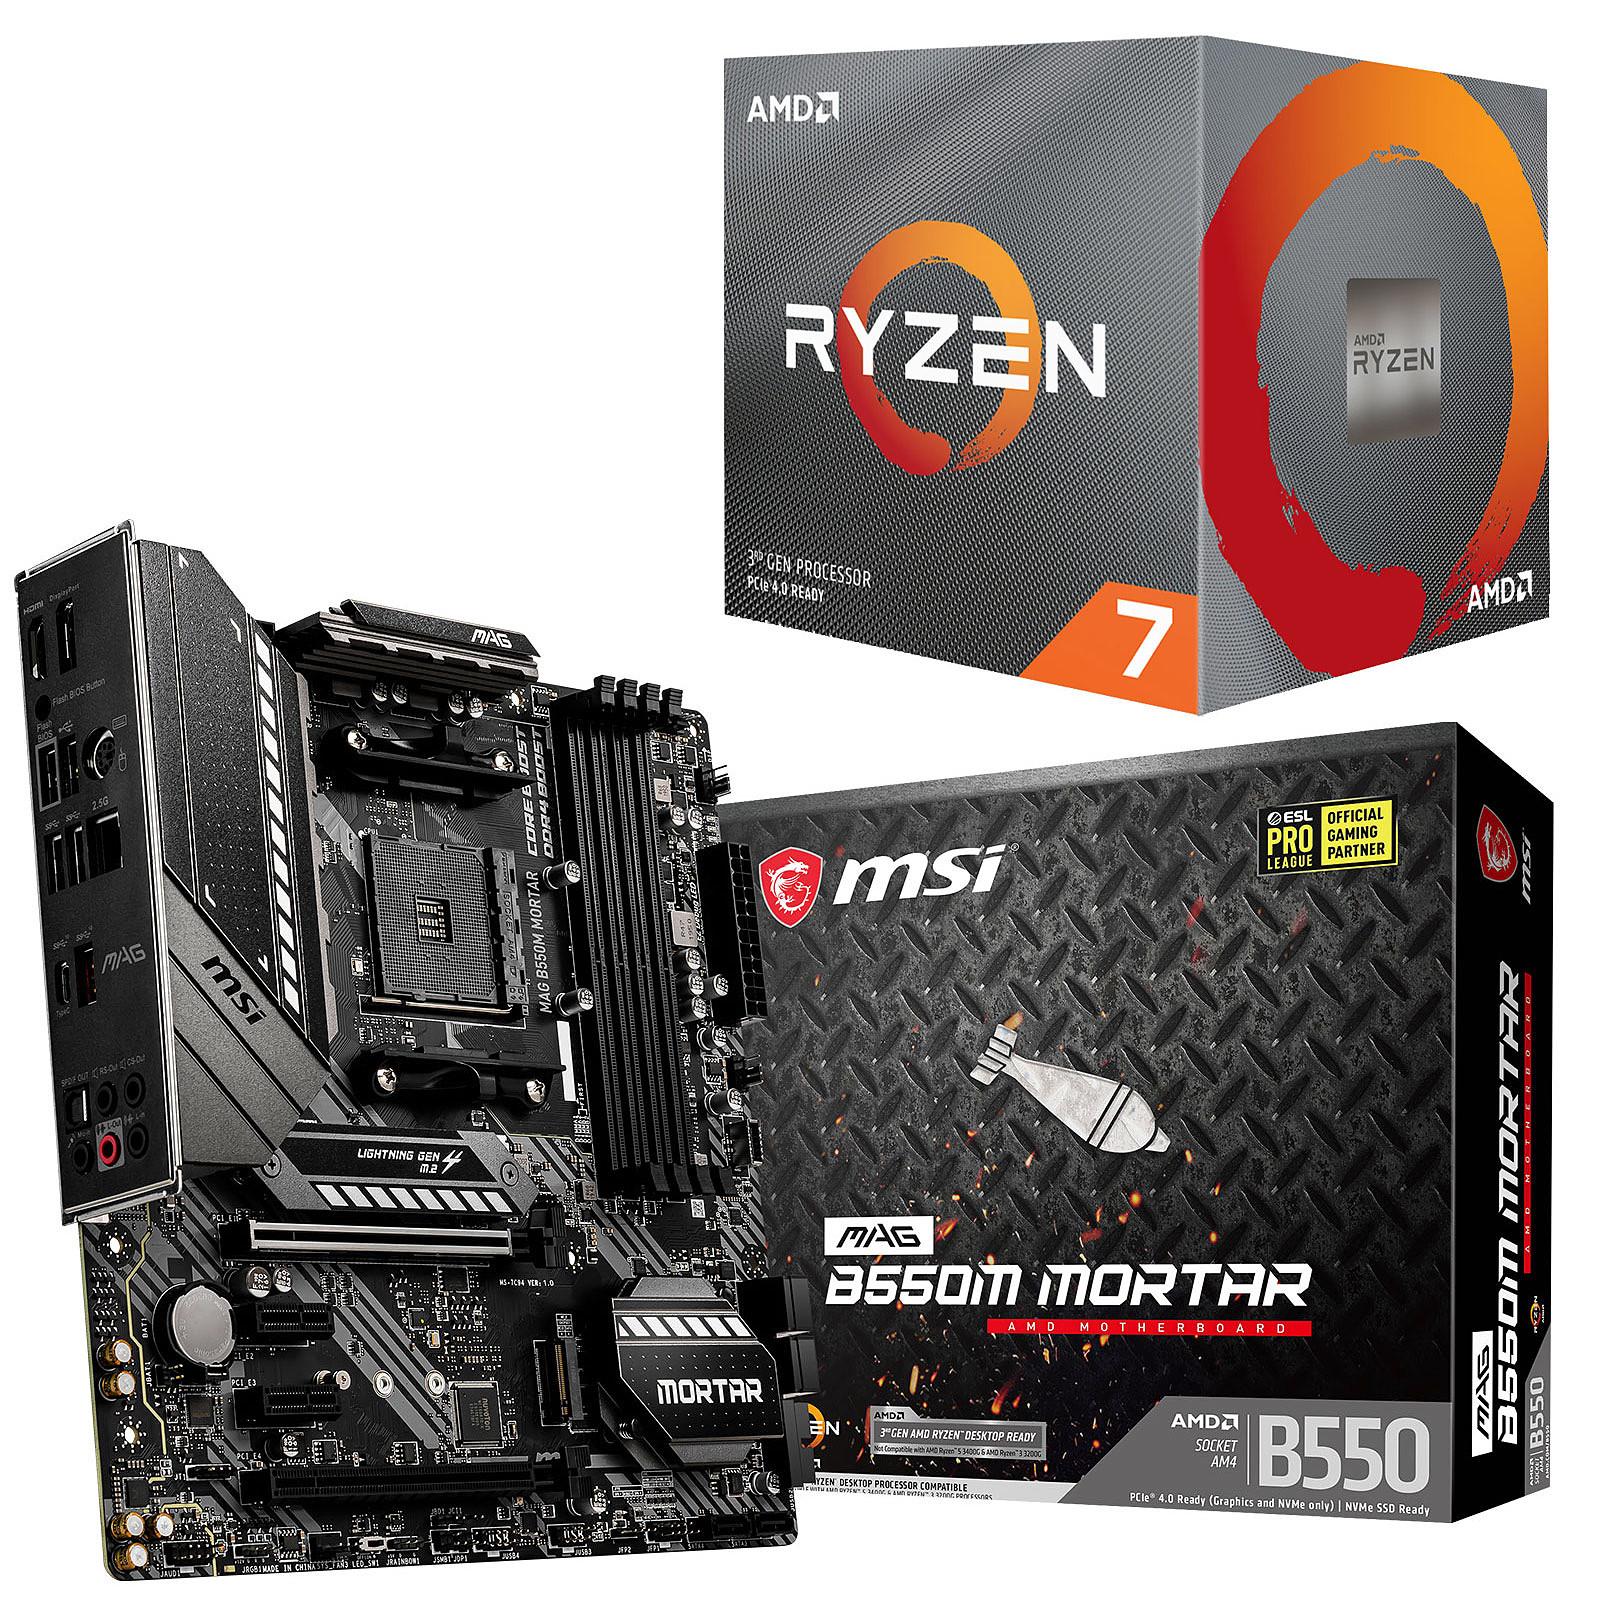 Kit Upgrade PC AMD Ryzen 7 3700X MSI MAG B550M MORTAR